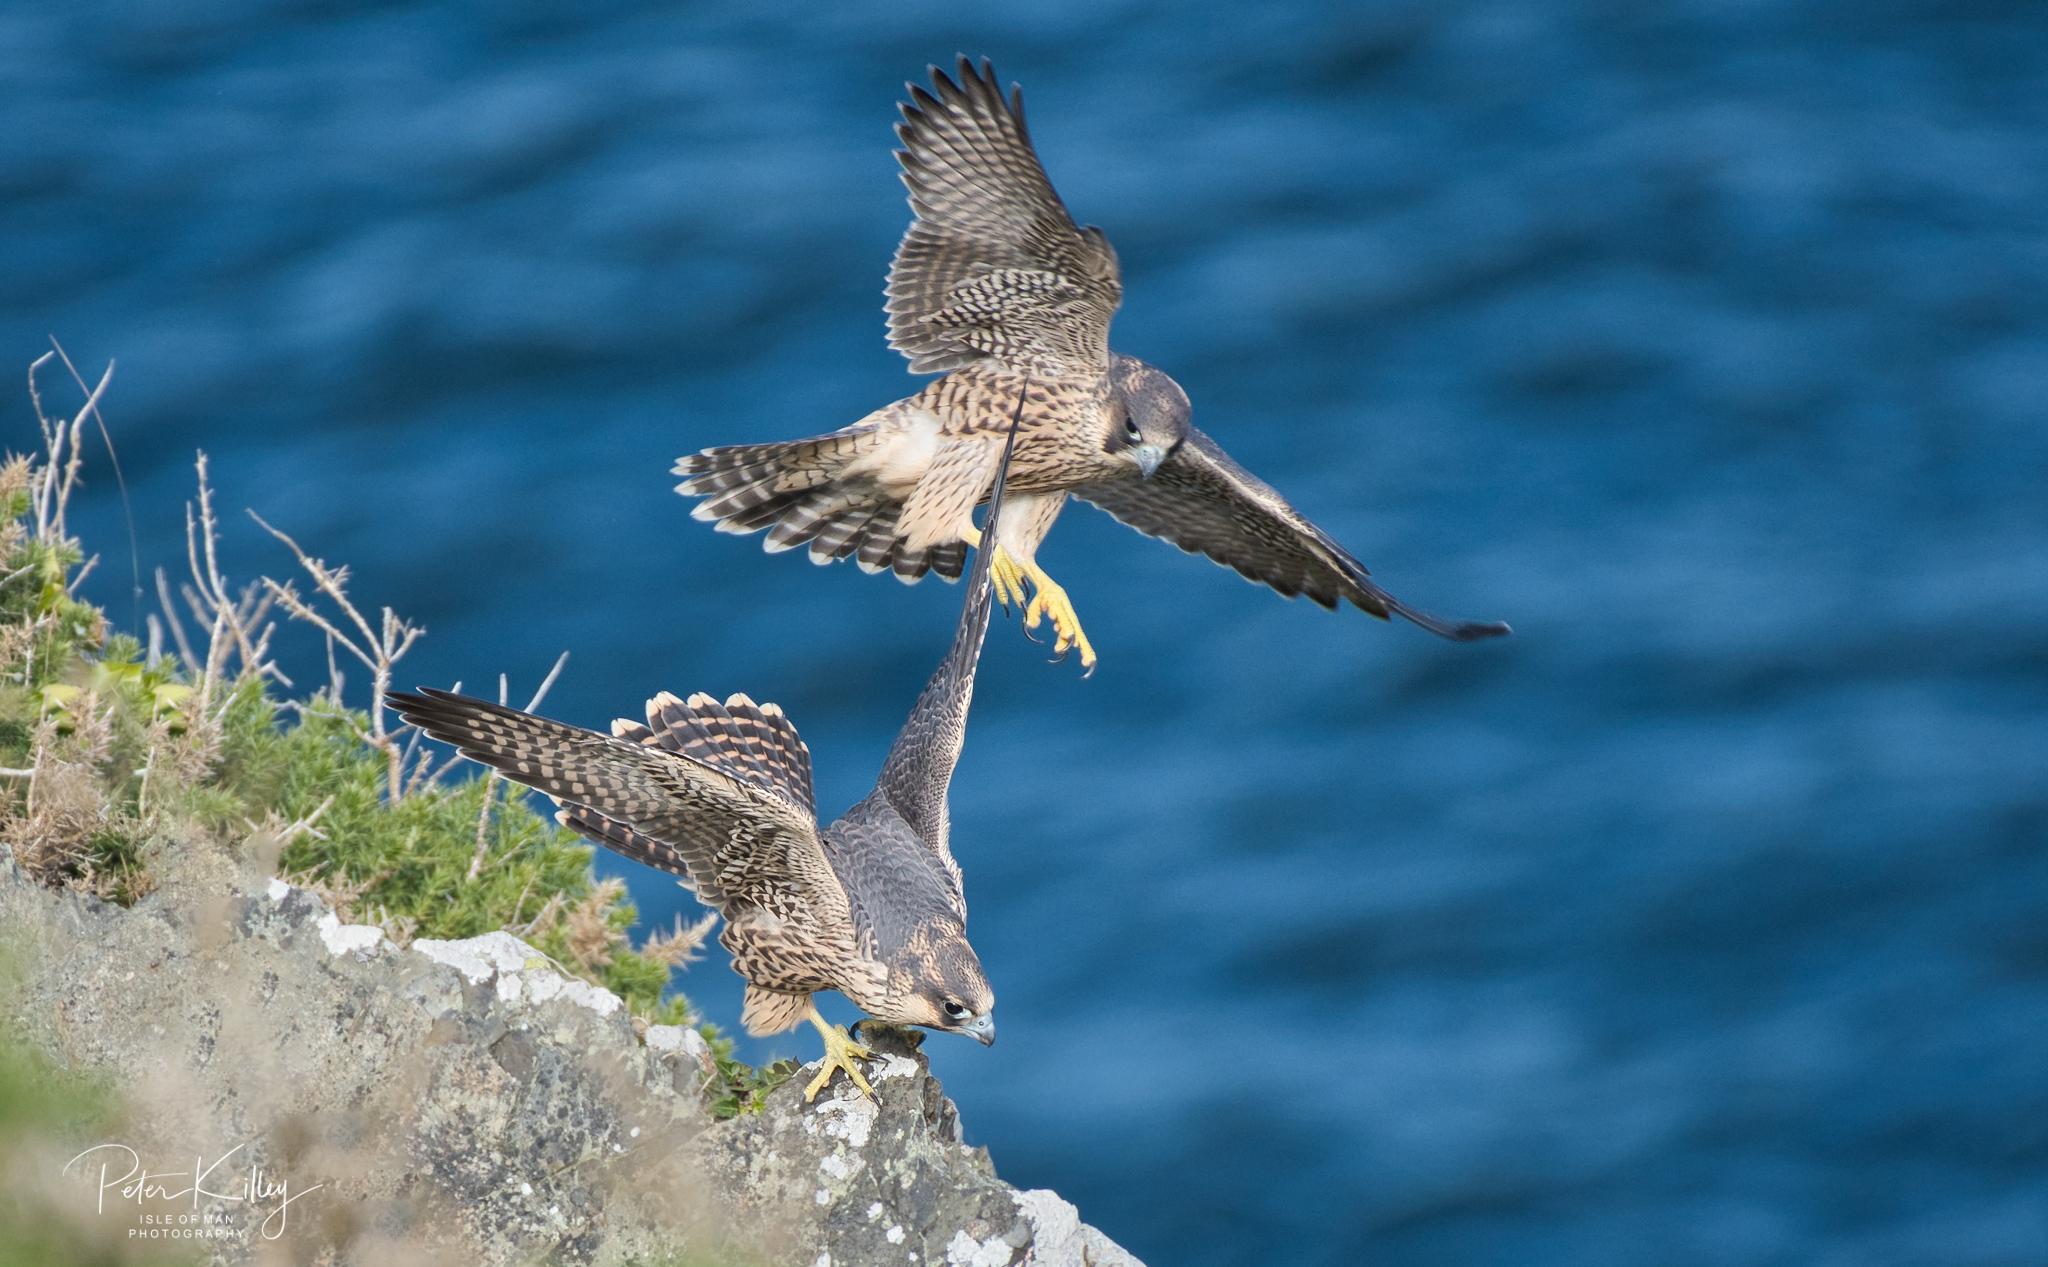 Juvenile Peregrine Falcons Isle of Man - © Peter Killey - www.manxscenes.com